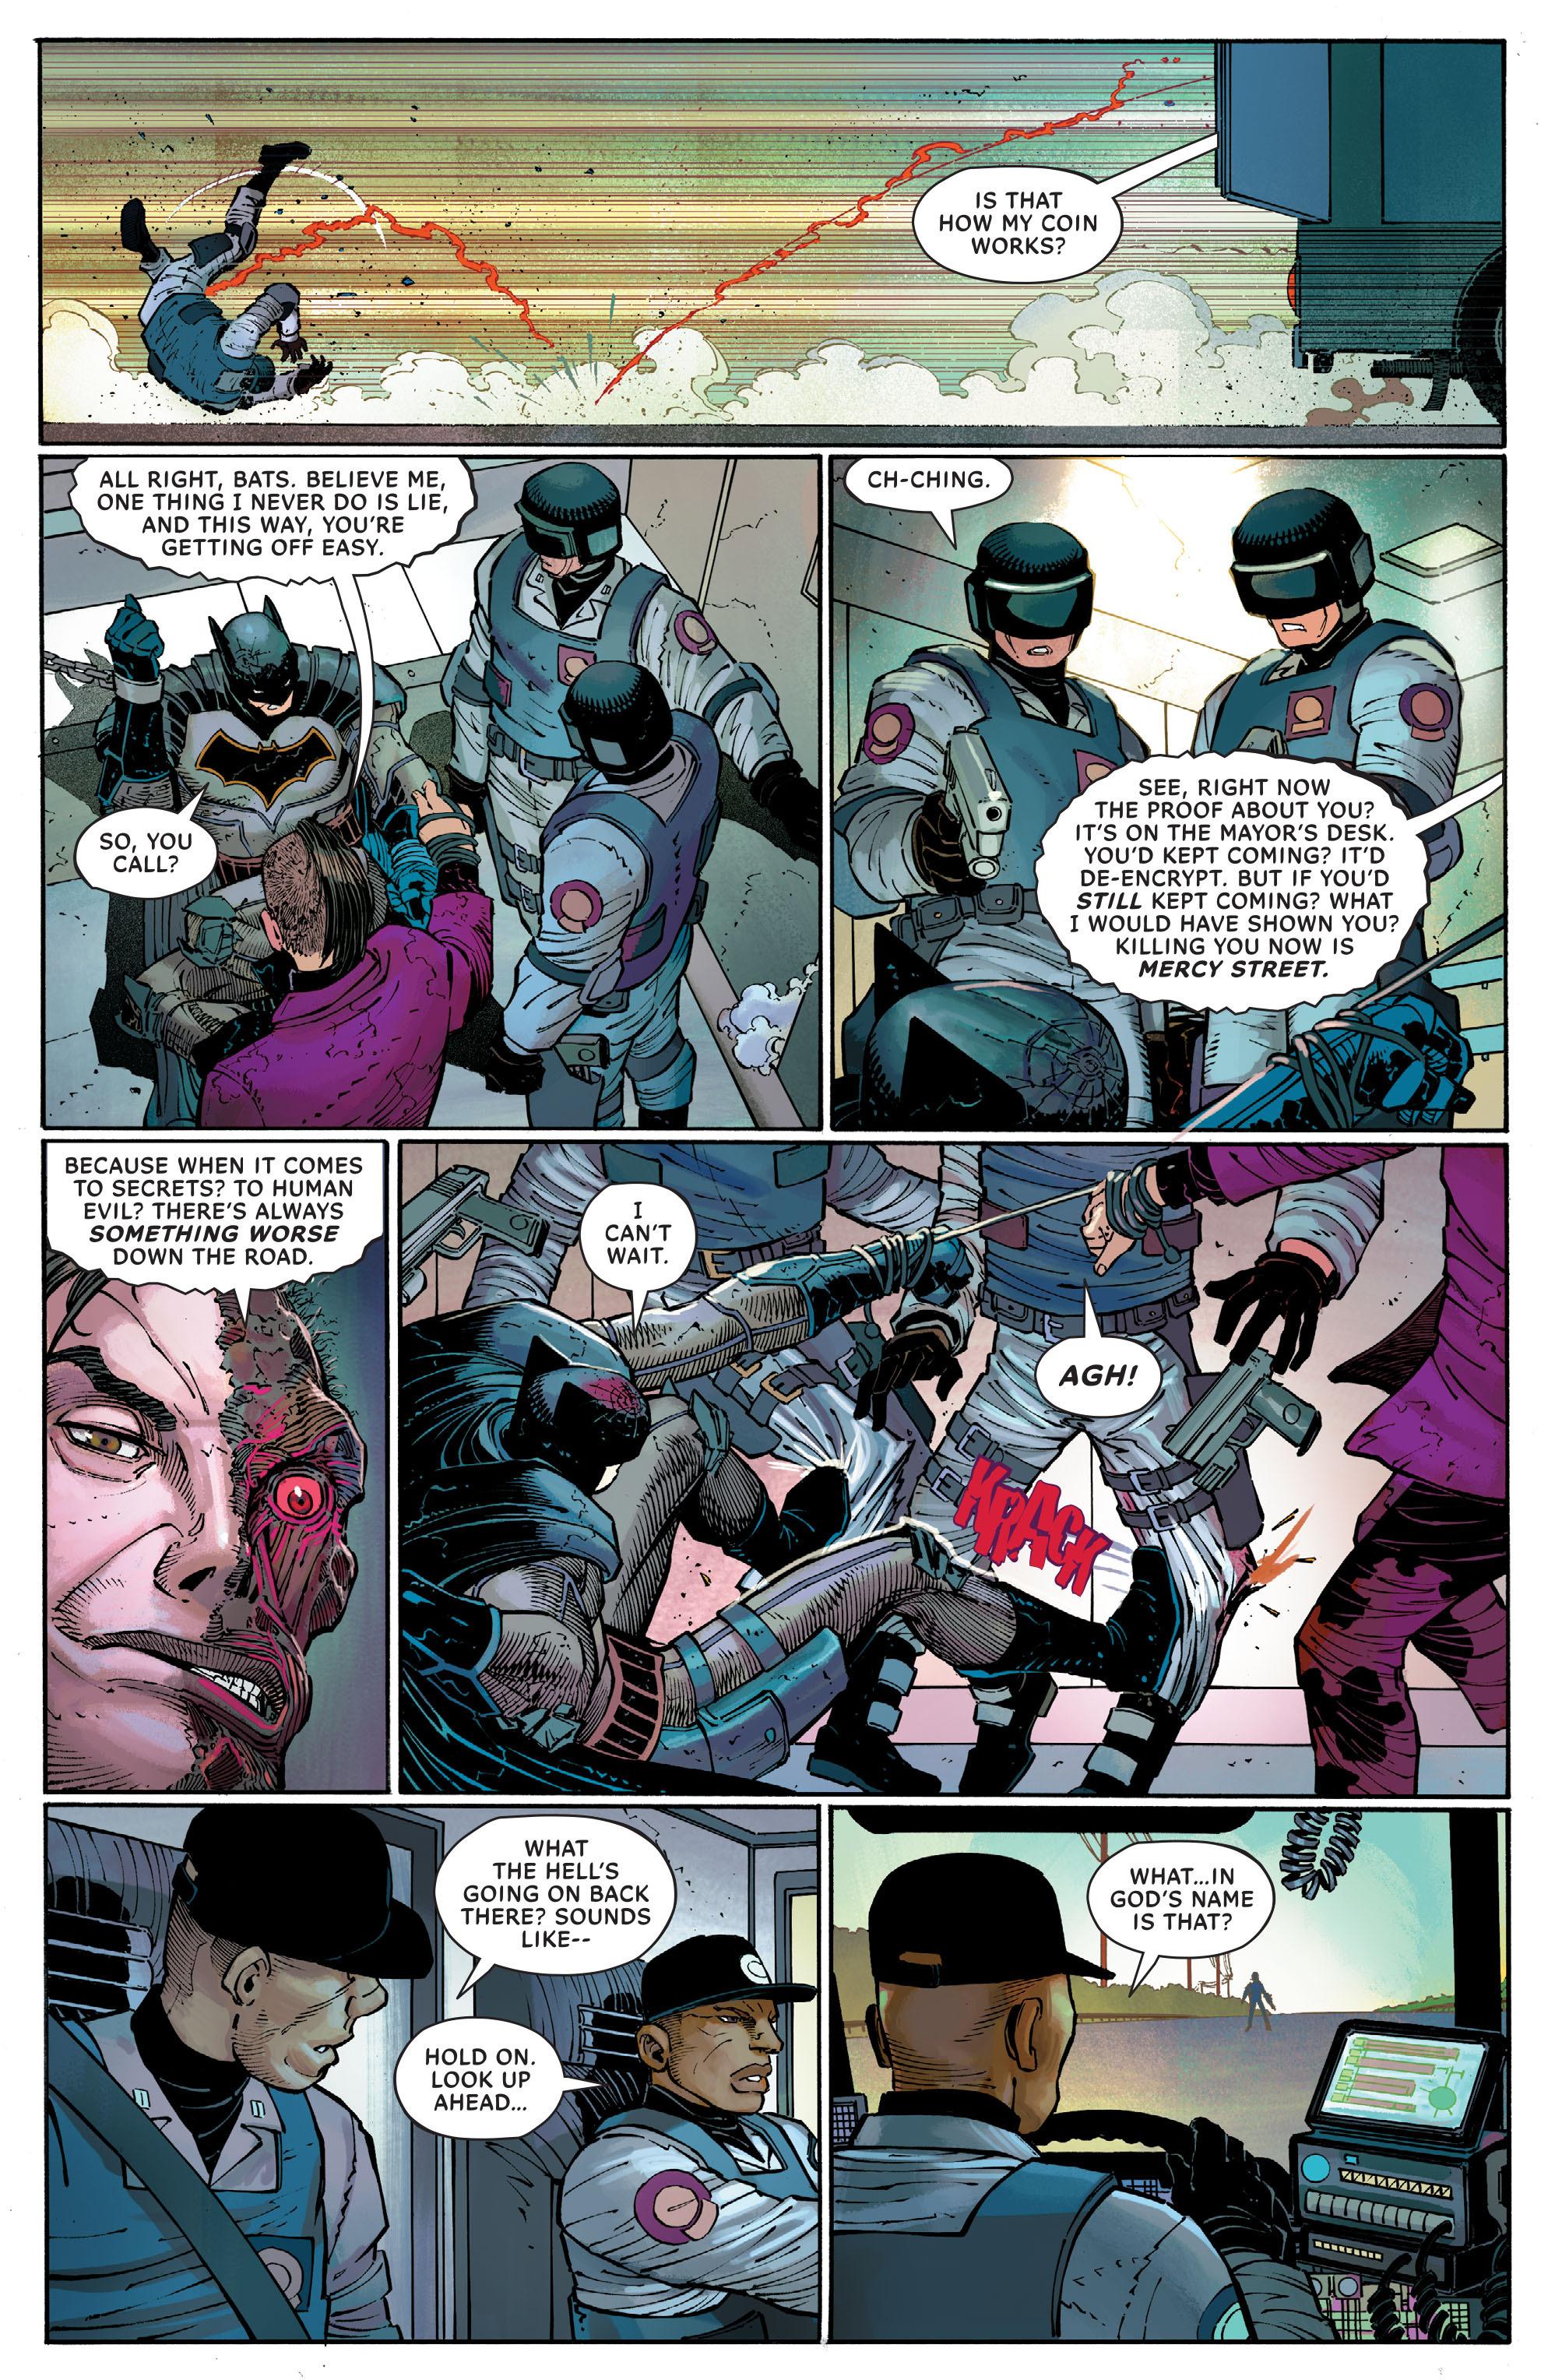 Read online All-Star Batman comic -  Issue #2 - 25